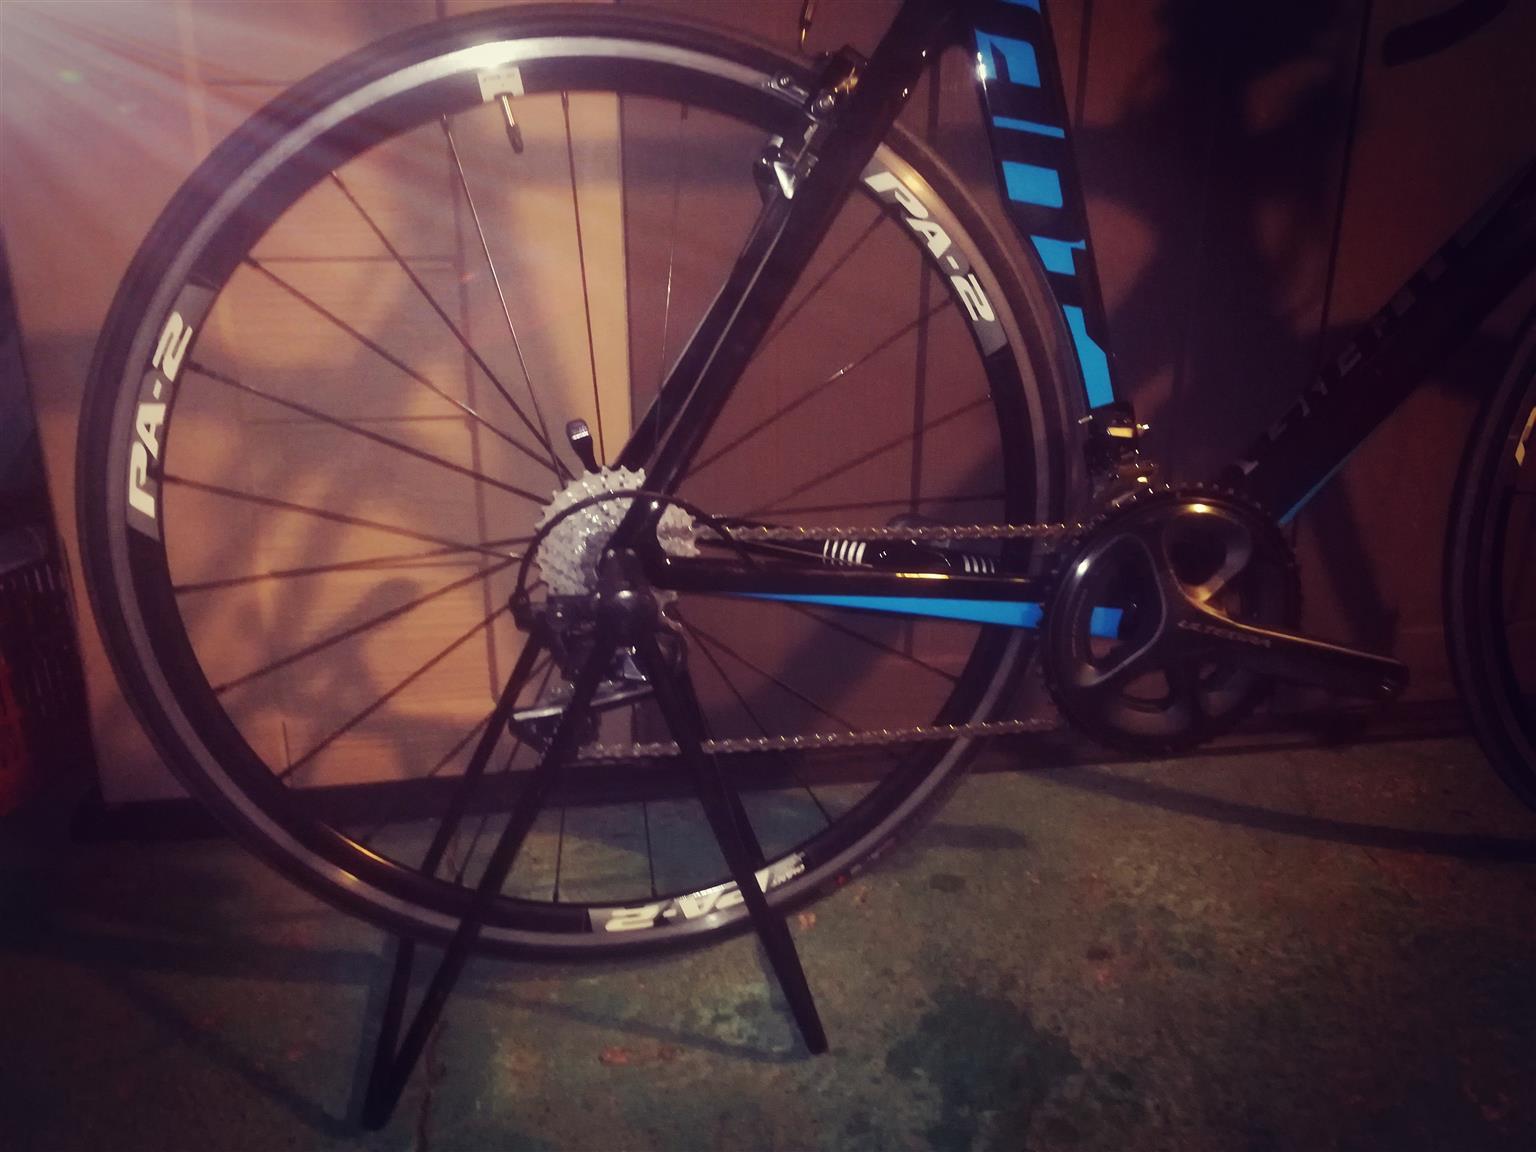 Full carbon 2015 GIANT road bike